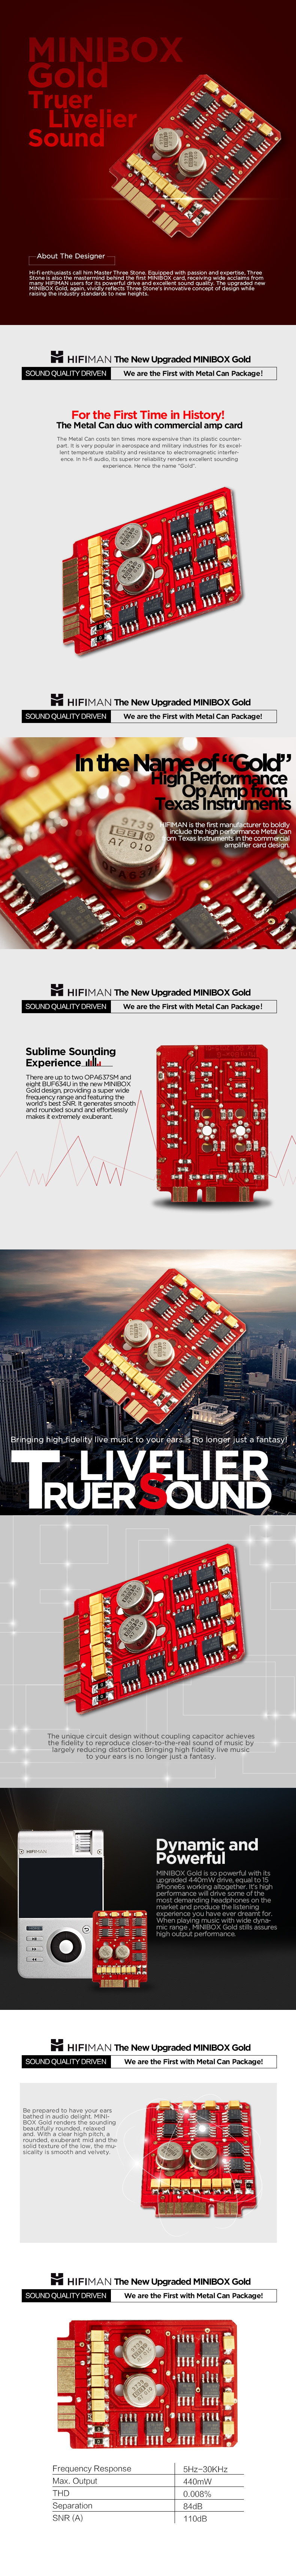 HIFIMAN MINIBOX Gold Amplifier Card for HM901U/802U/901s/901/802/650